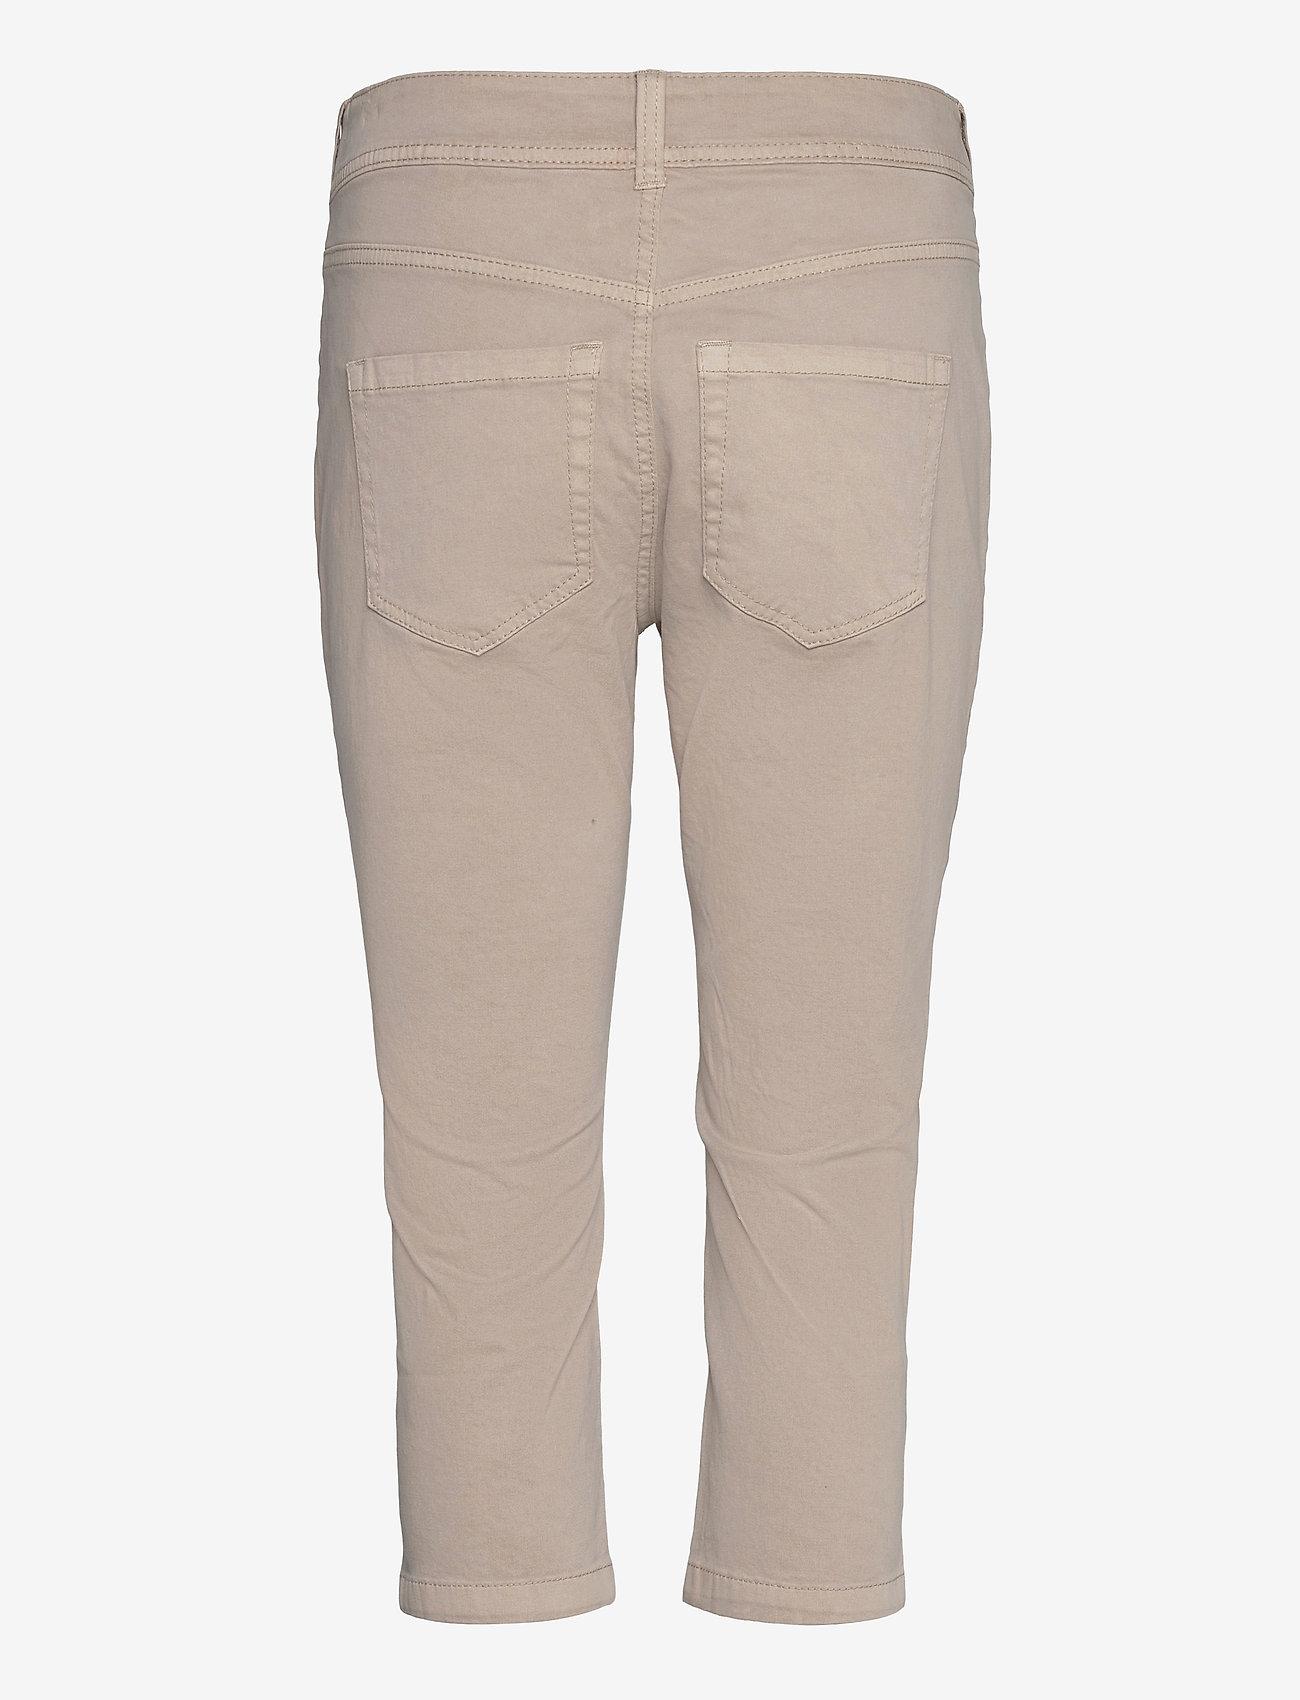 Tom Tailor - Tom Tailor K - pantalons capri - dusty taupe - 1